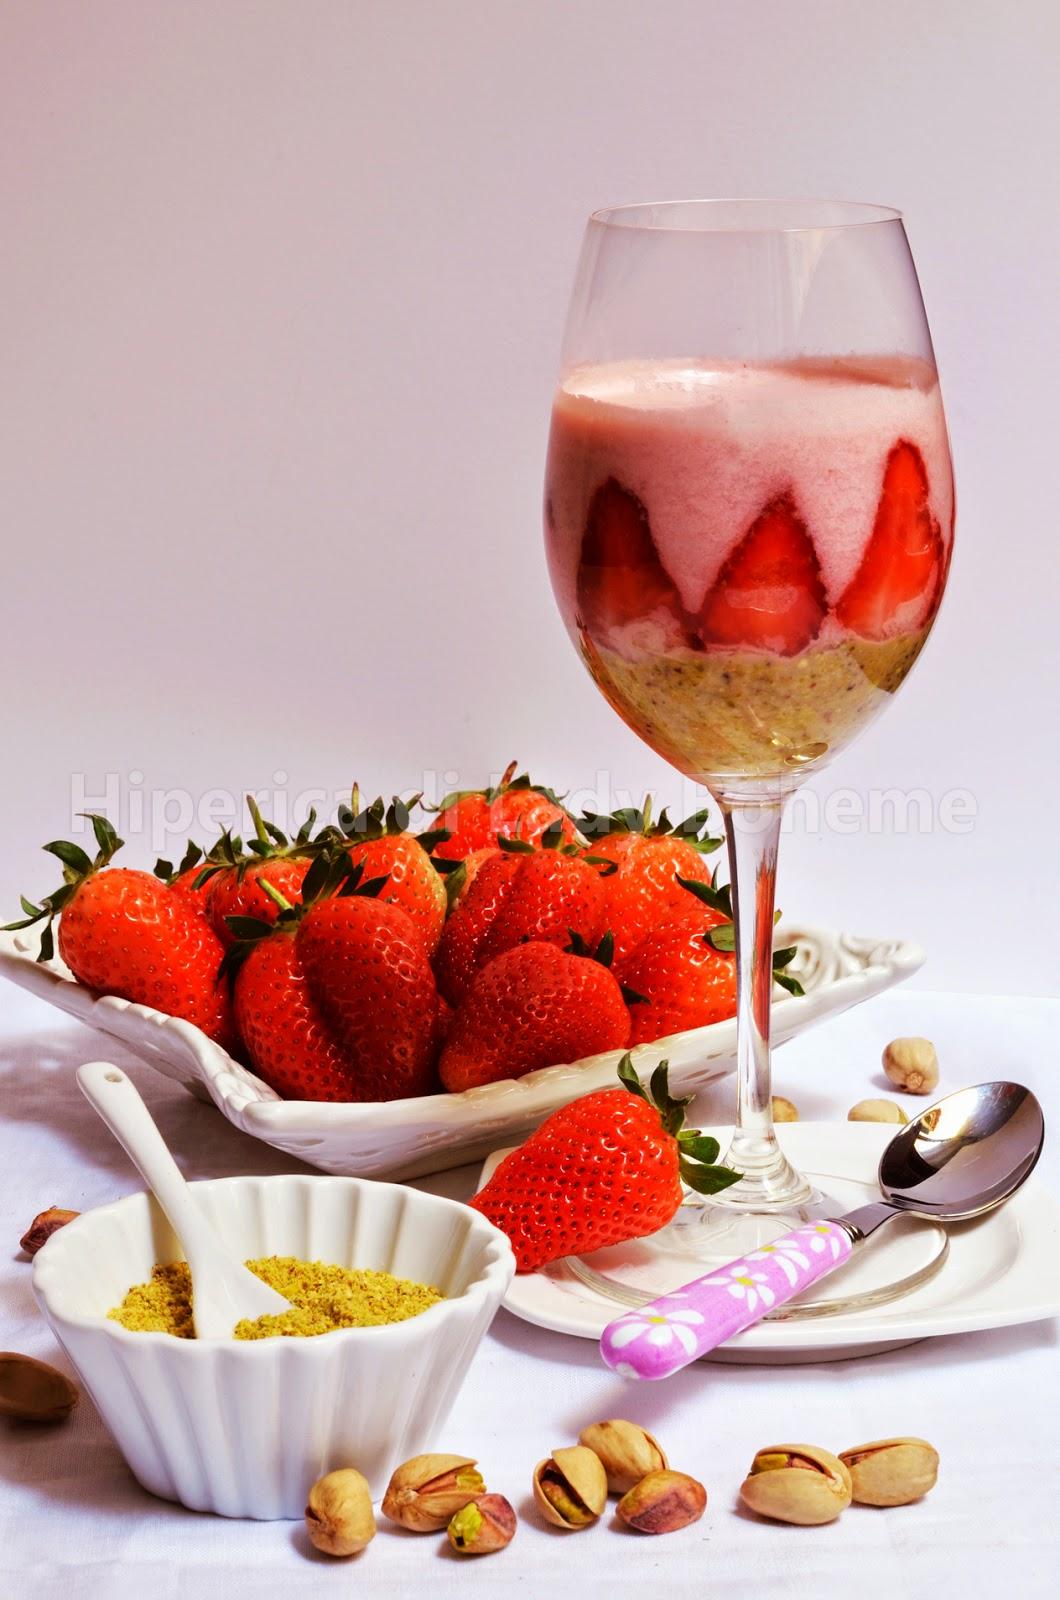 hiperica_lady_boheme_blog_cucina_ricette_gustose_facili_veloci_mousse_alla_fragola_e_pistacchio_2